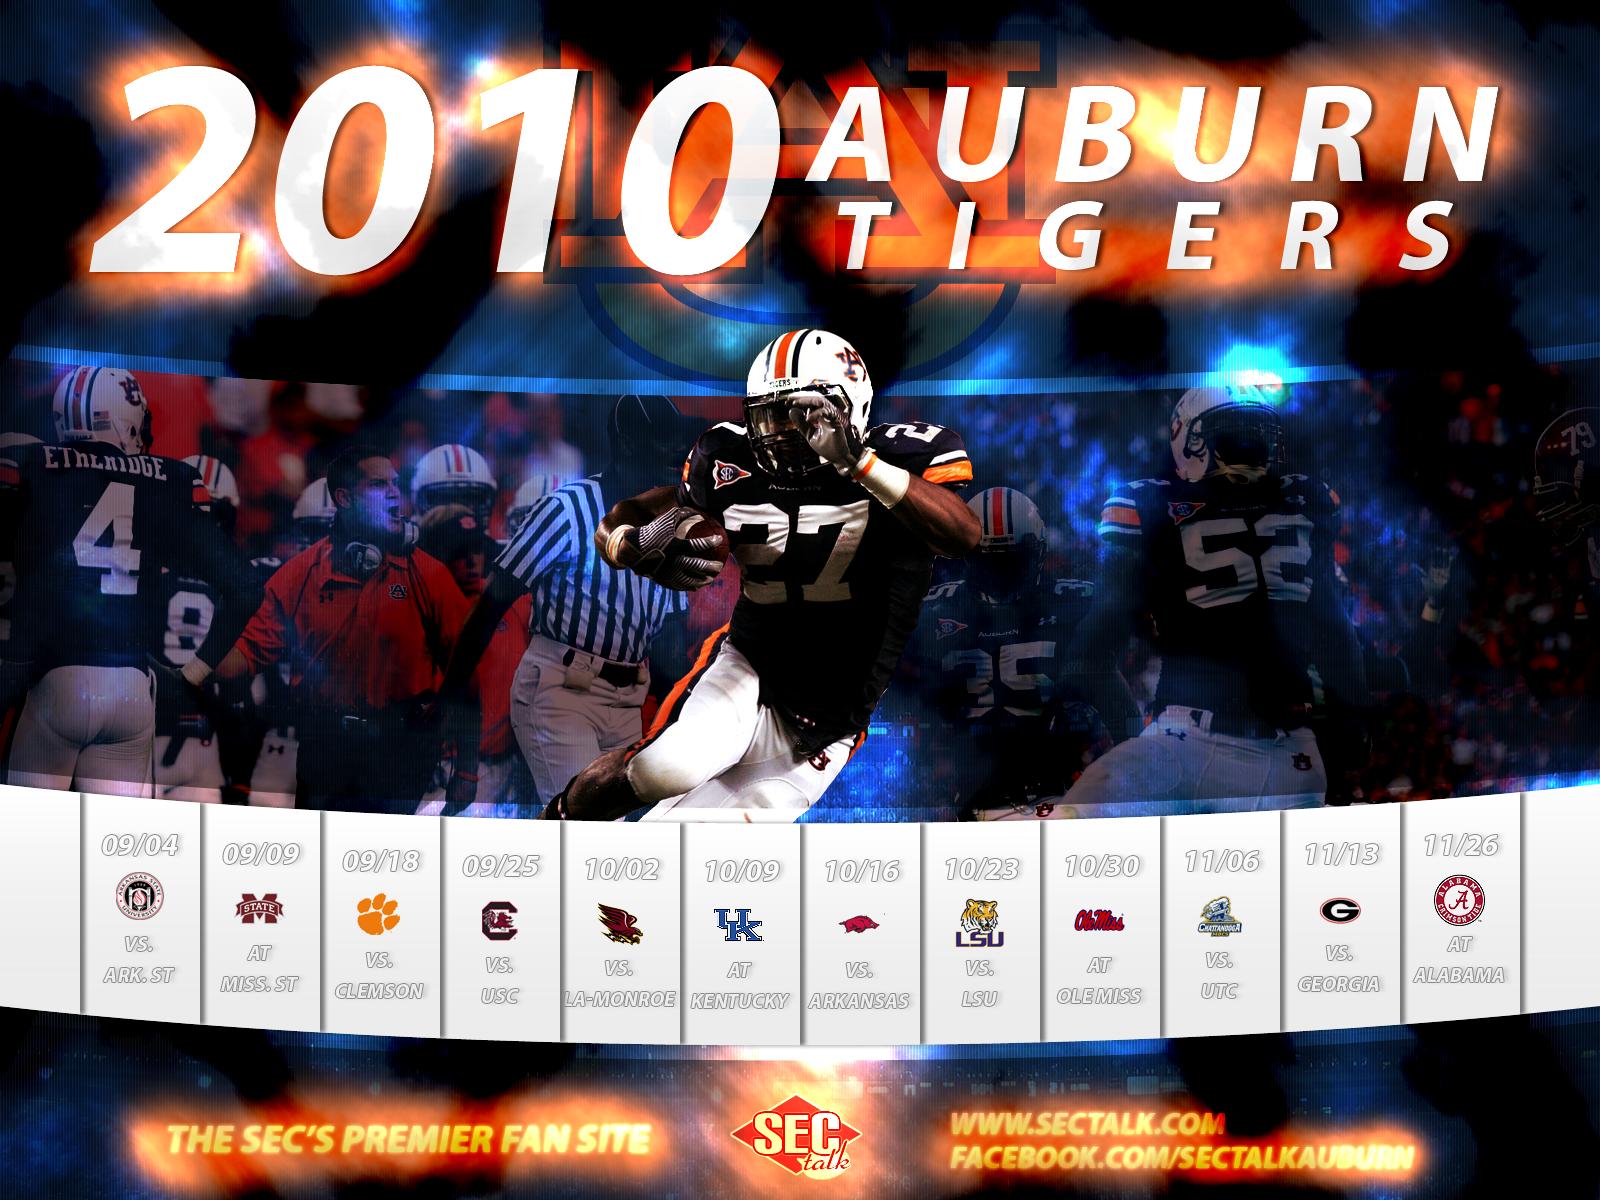 Free Auburn Tigers Desktop Wallpaper